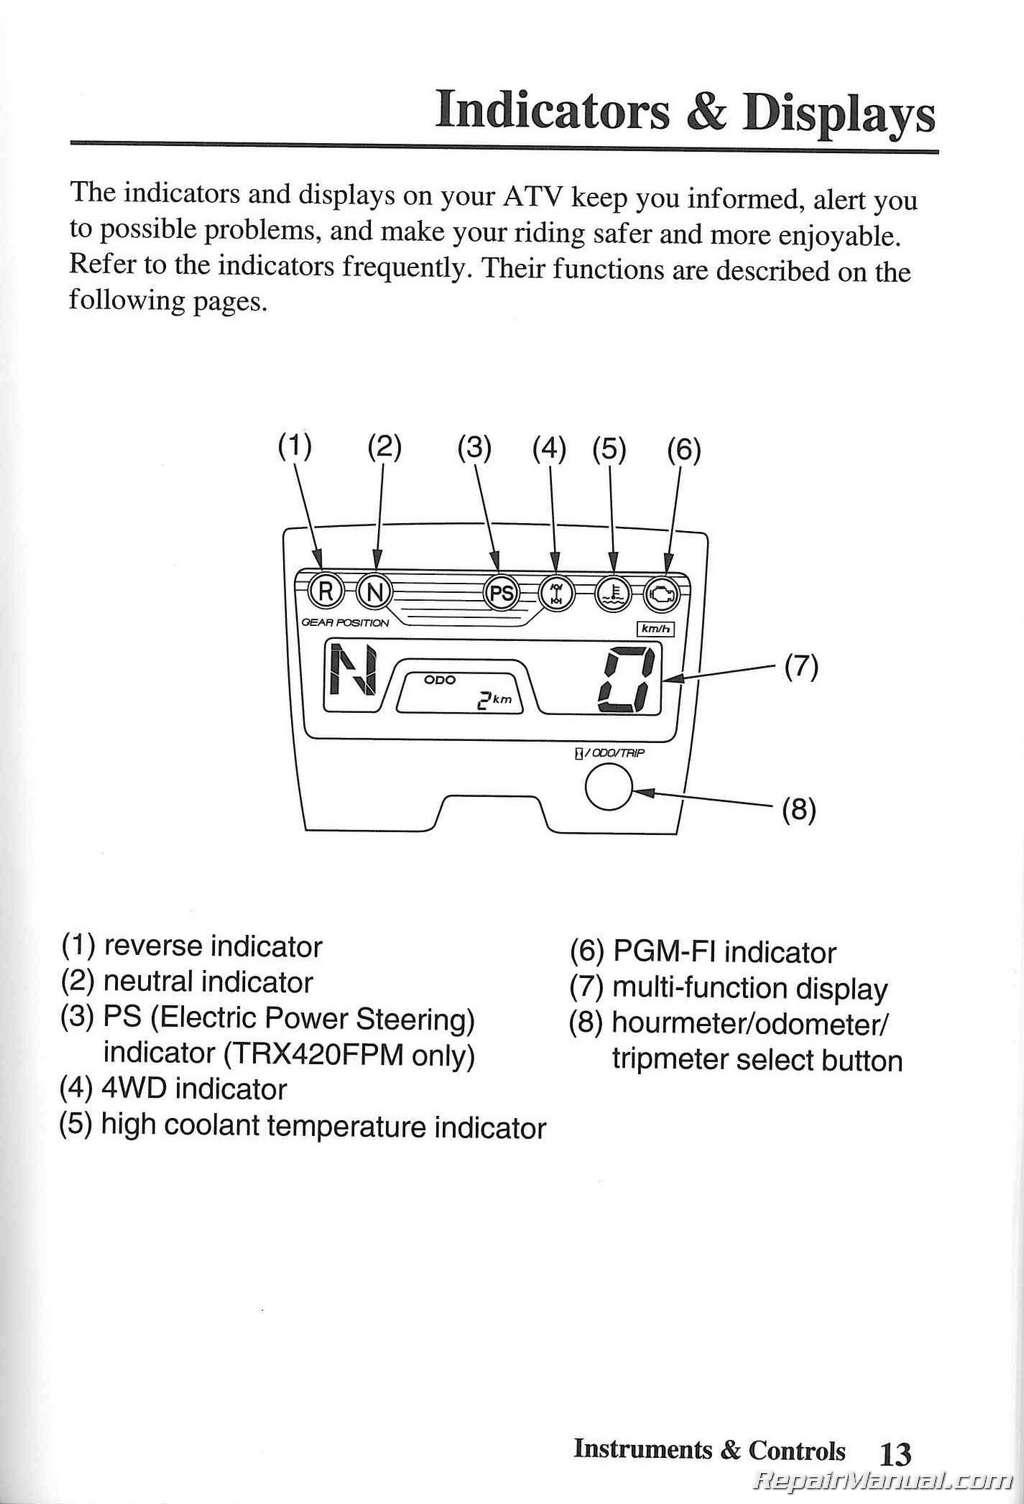 2010 Honda Rancher Diagram Simple Guide About Wiring 420 Trx Owner S Manual Trx420fm Fpm Fourtrax Rh Repairmanual Com Rear End